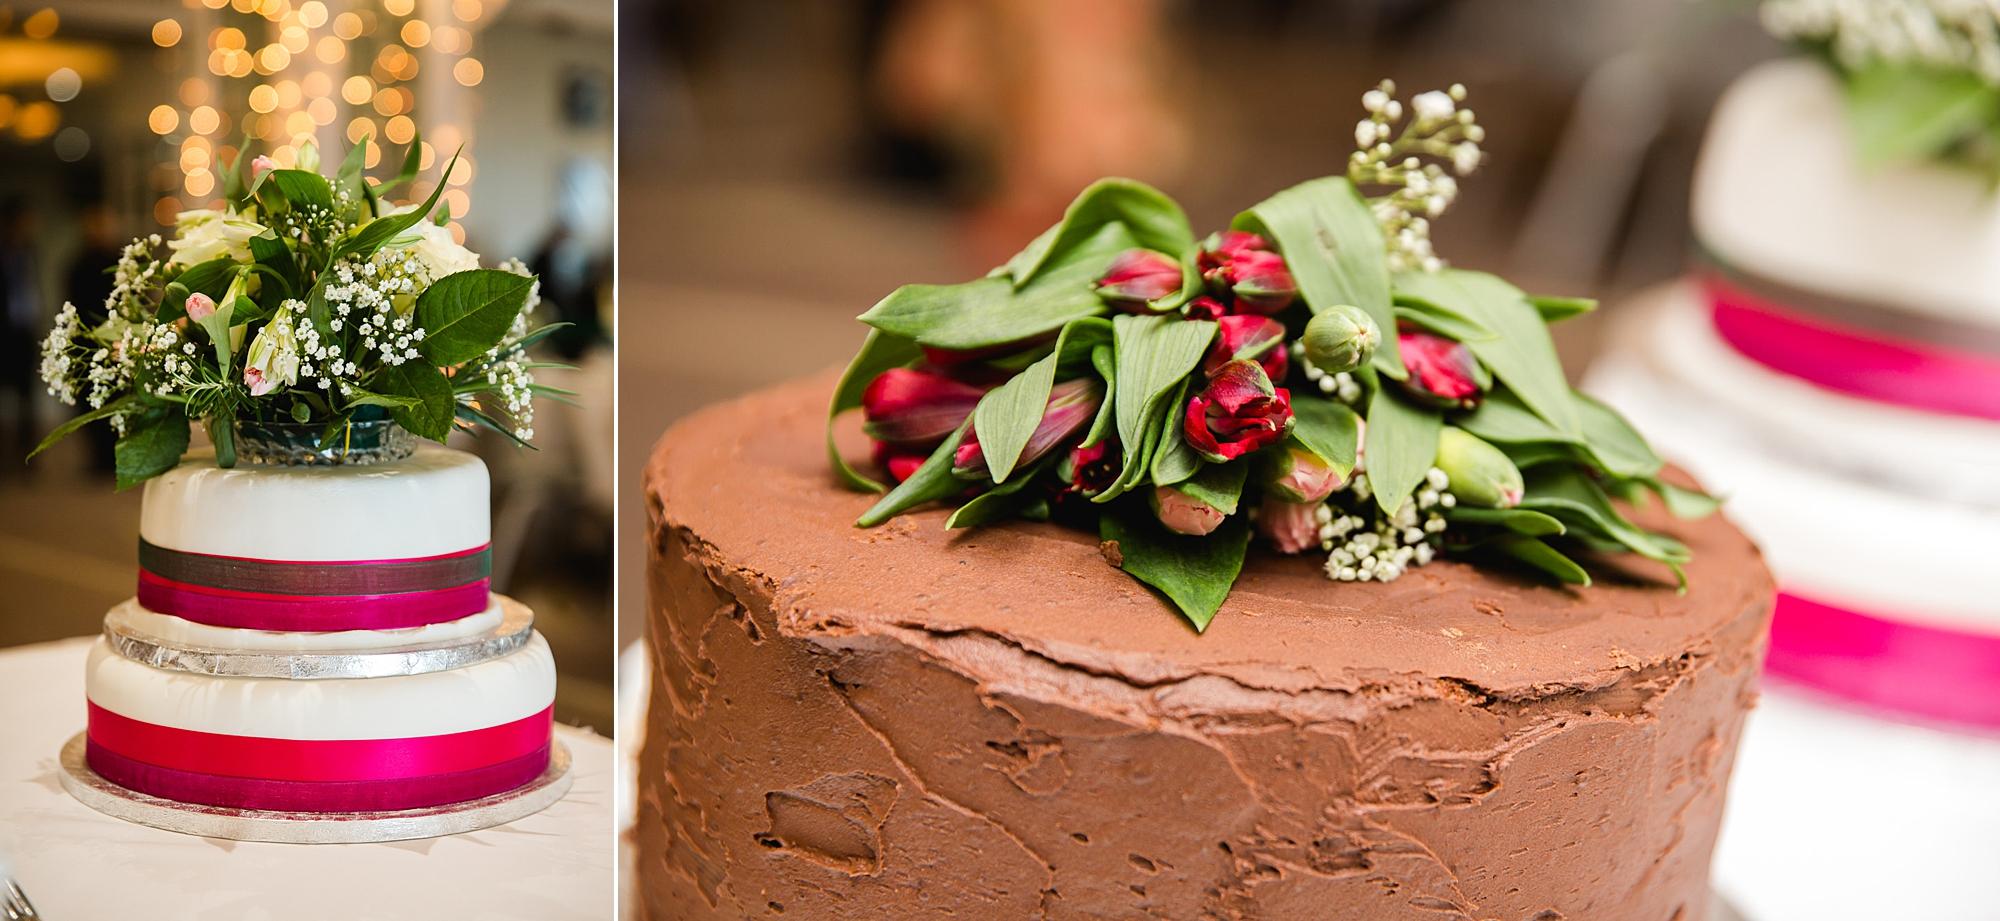 Richmond Hill Hotel wedding cakes